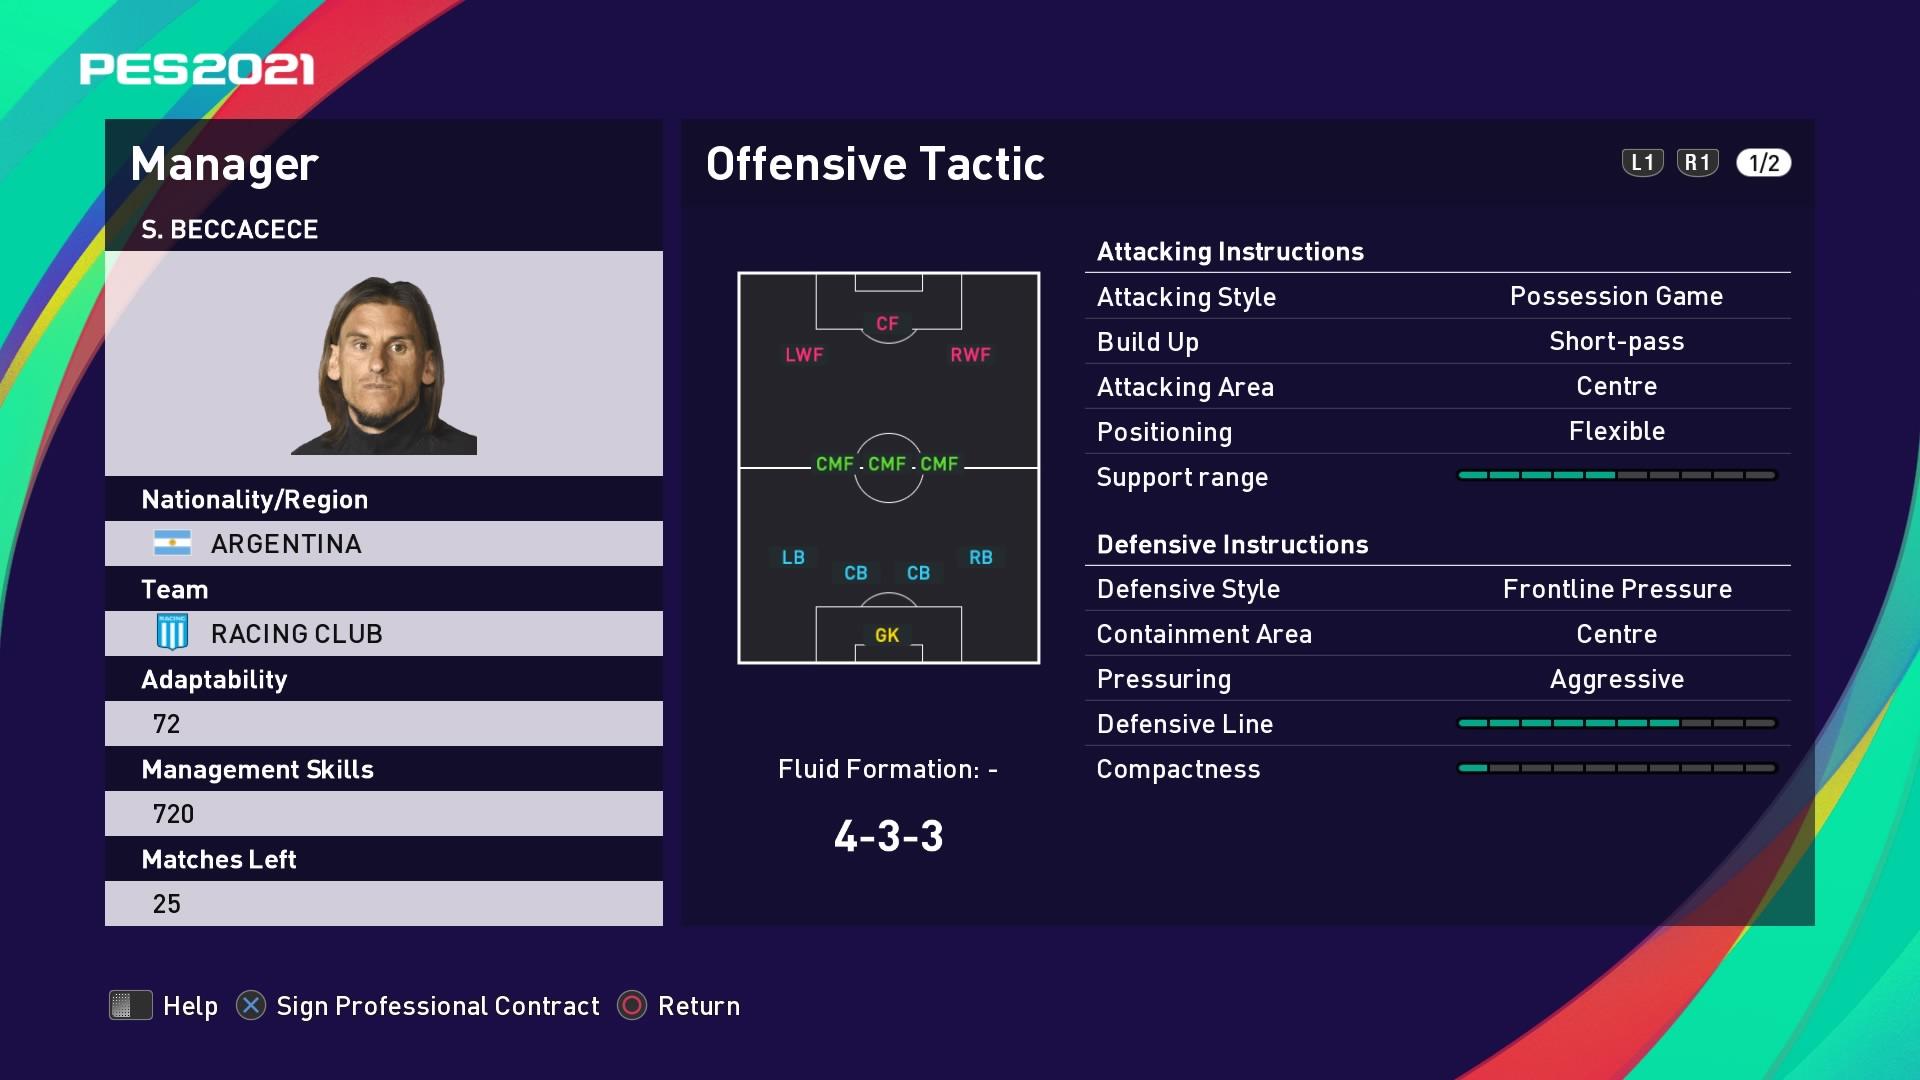 S. Beccacece (Sebastián Beccacece) Offensive Tactic in PES 2021 myClub